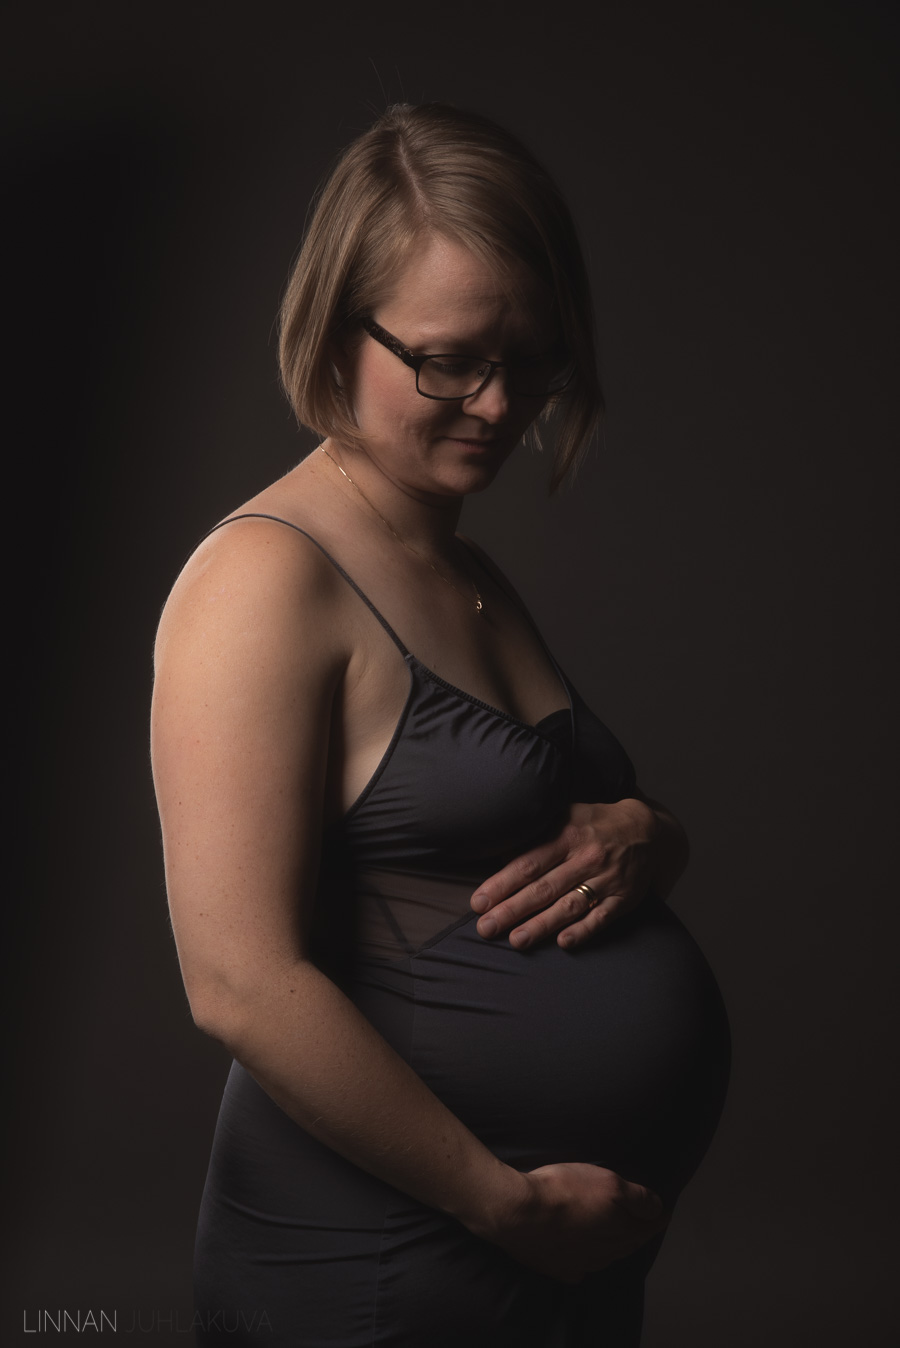 raskaus-odotusajan-kuvaus-1.jpg